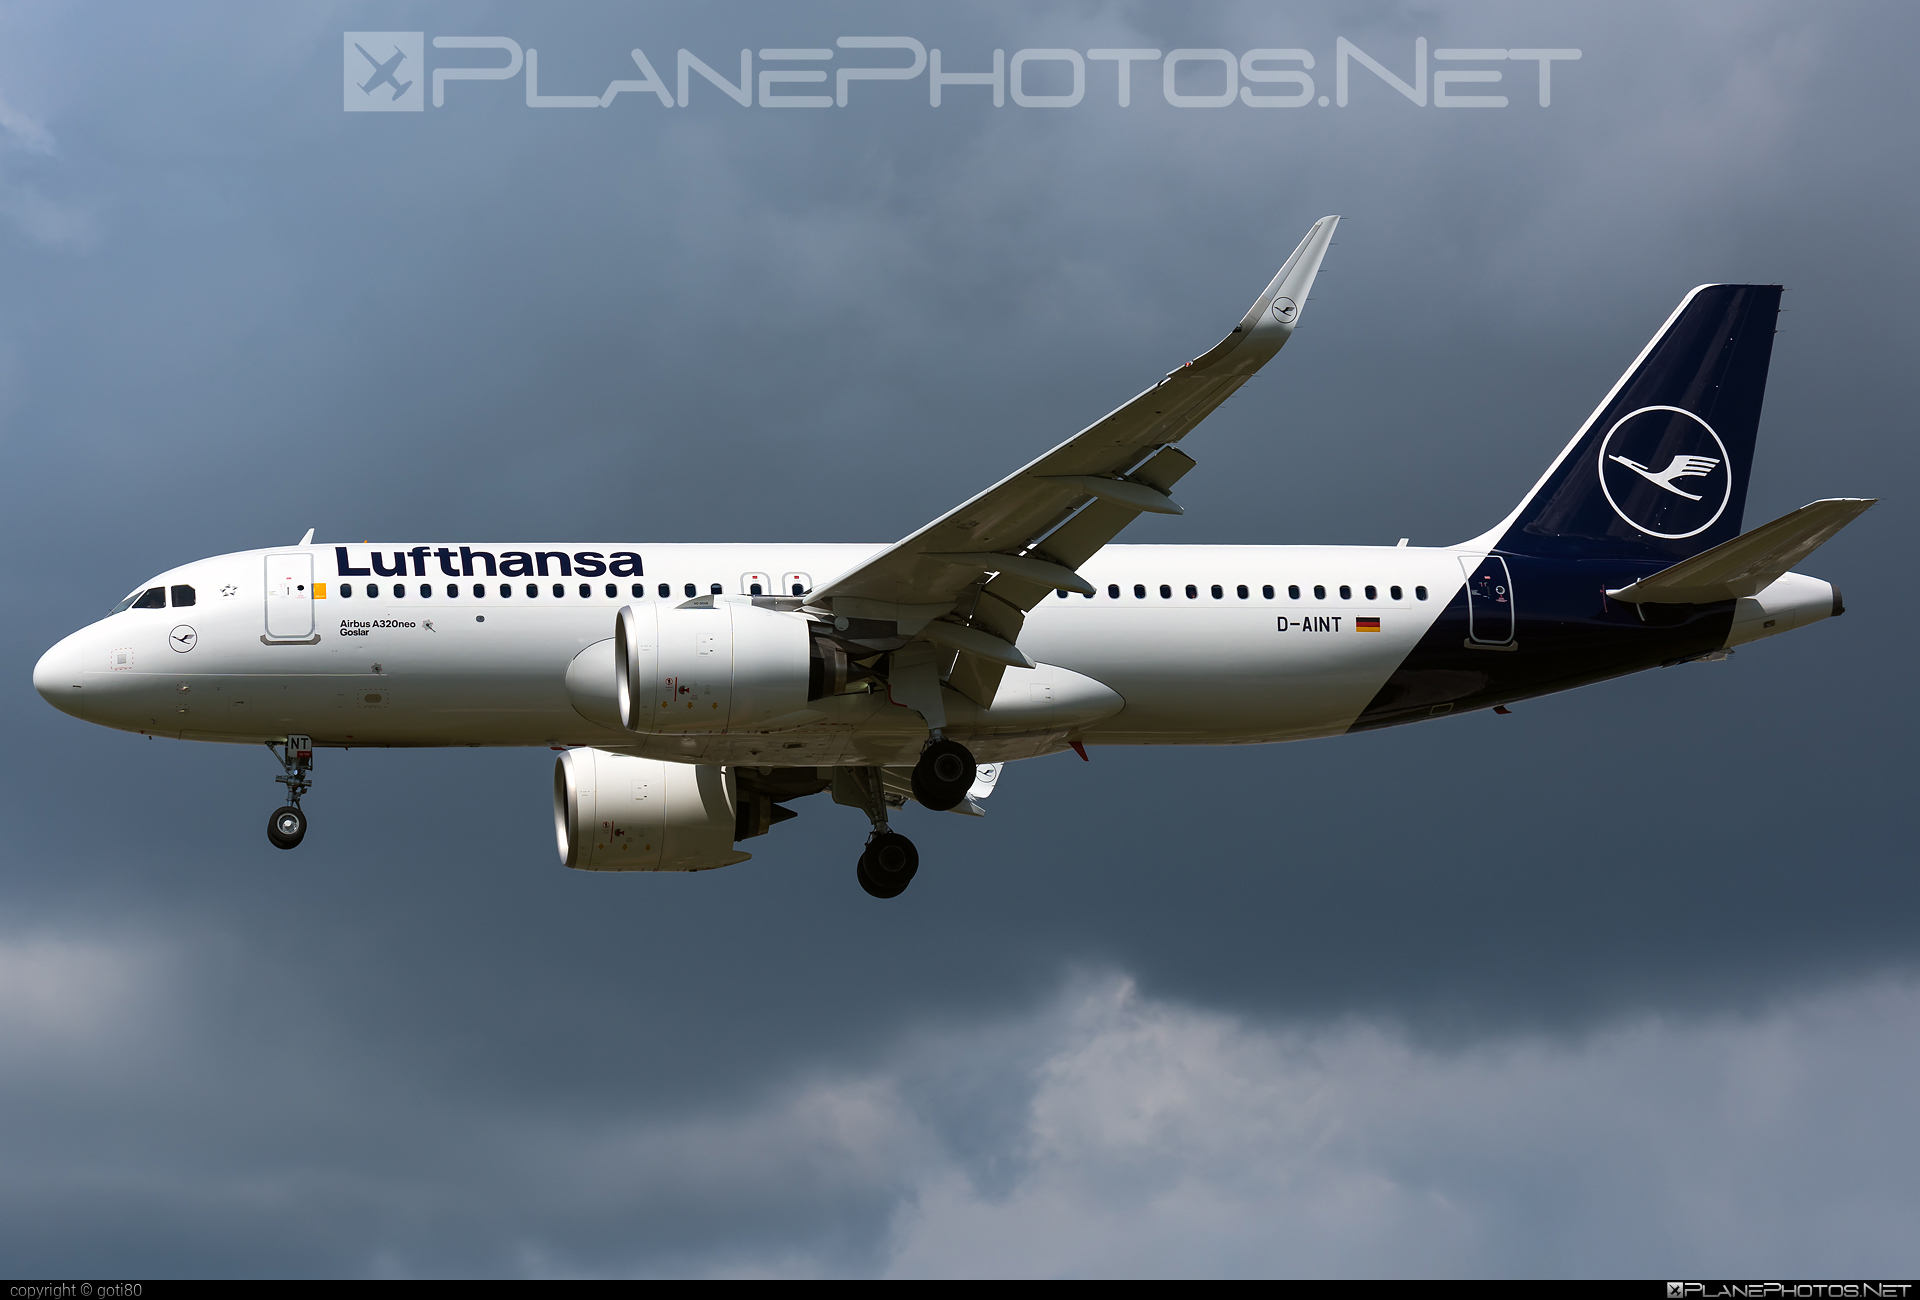 Airbus A320-271N - D-AINT operated by Lufthansa #a320 #a320family #a320neo #airbus #airbus320 #lufthansa